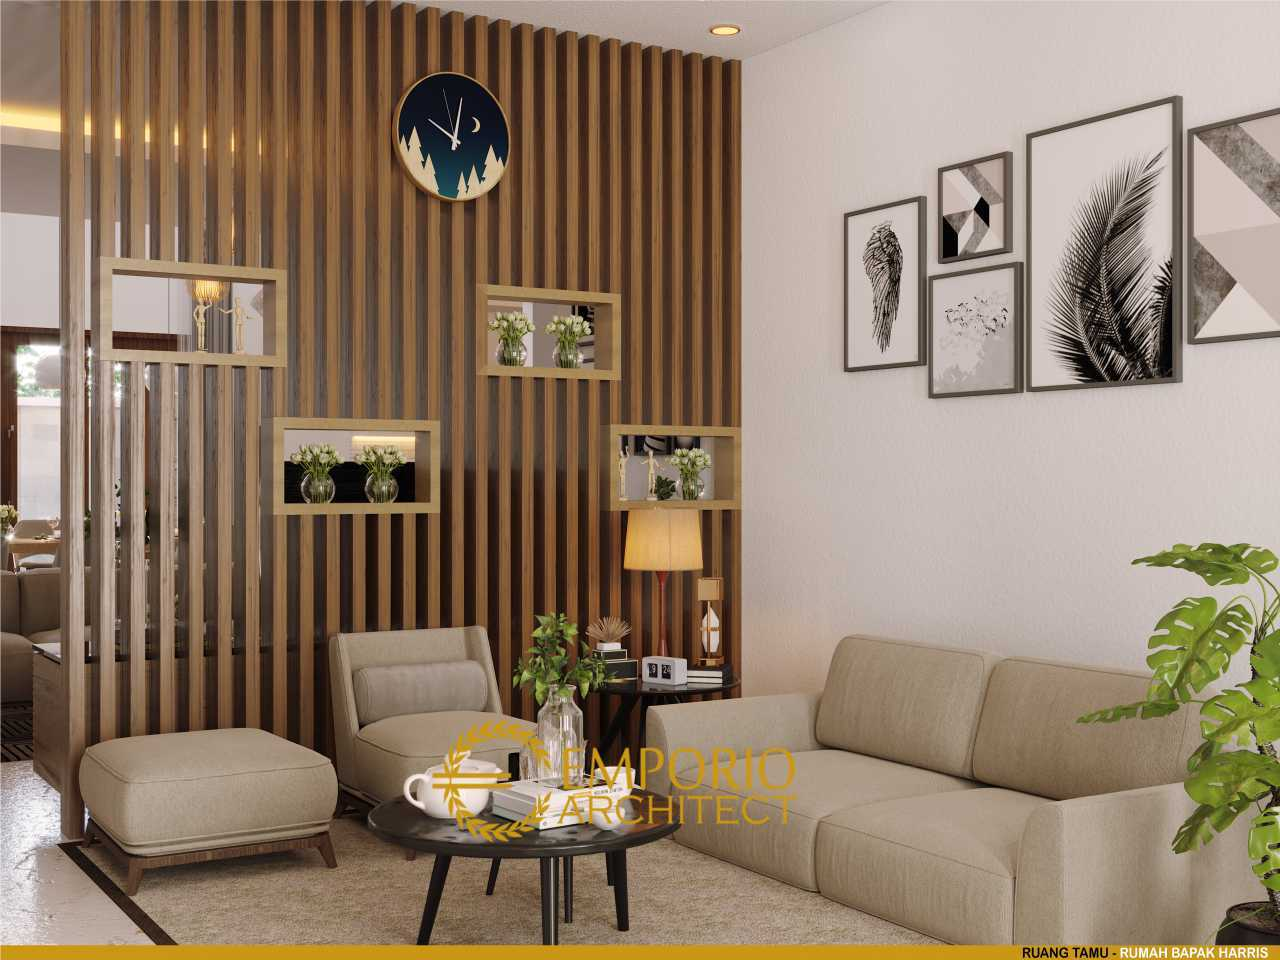 Emporio Architect Jasa Arsitek Riau Desain Rumah Modern 2 Lantai 758 @ Pekanbaru, Riau Pekanbaru, Kota Pekanbaru, Riau, Indonesia Pekanbaru, Kota Pekanbaru, Riau, Indonesia Emporio-Architect-Jasa-Arsitek-Riau-Desain-Rumah-Modern-2-Lantai-758-Pekanbaru-Riau   87021